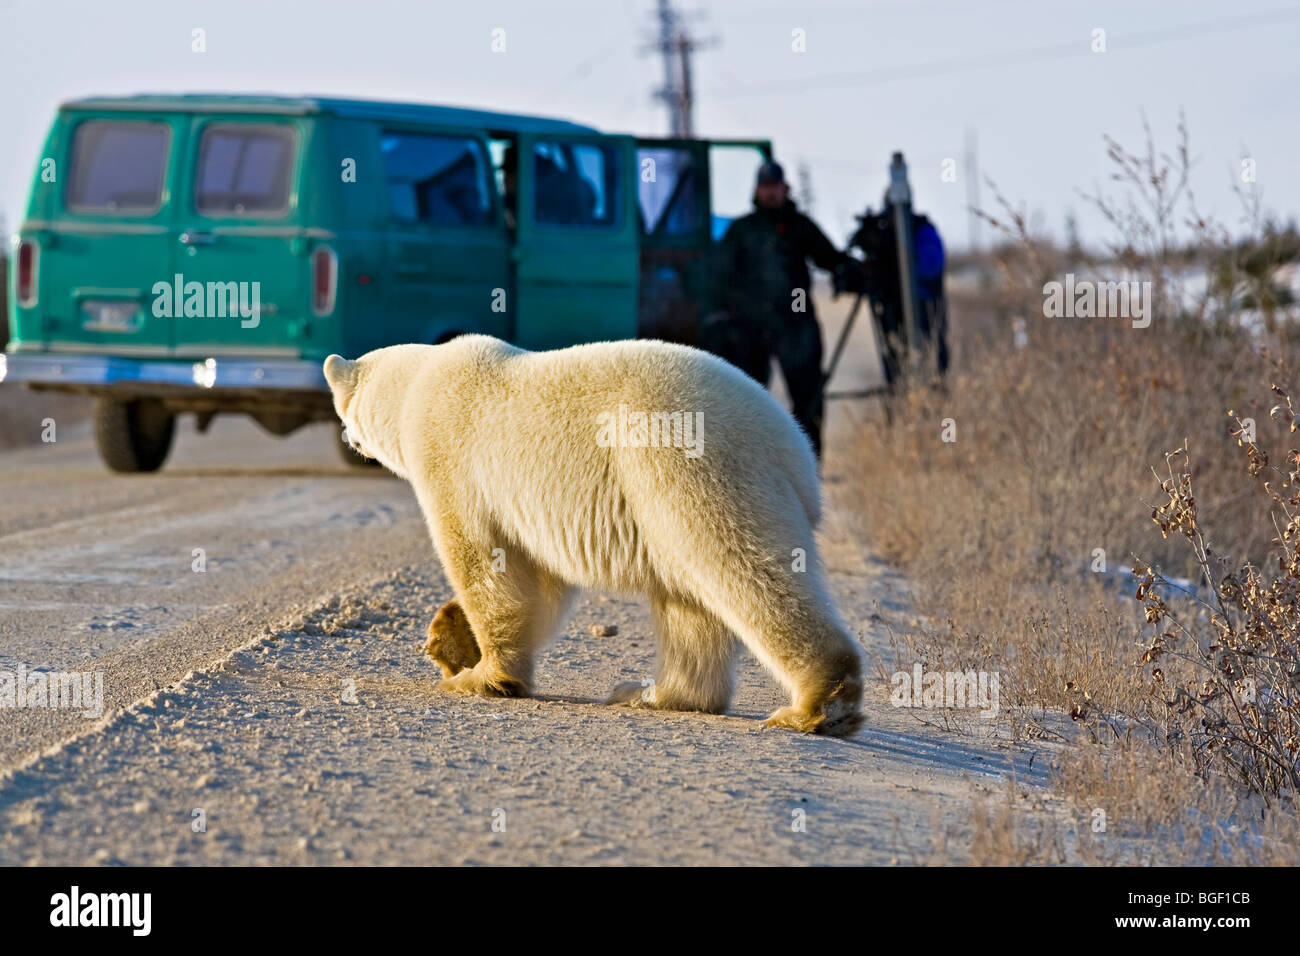 Polar Bear, Ursus maritimus, crossing the road near tourists in Hudson Bay, Churchill, Manitoba, Canada. - Stock Image